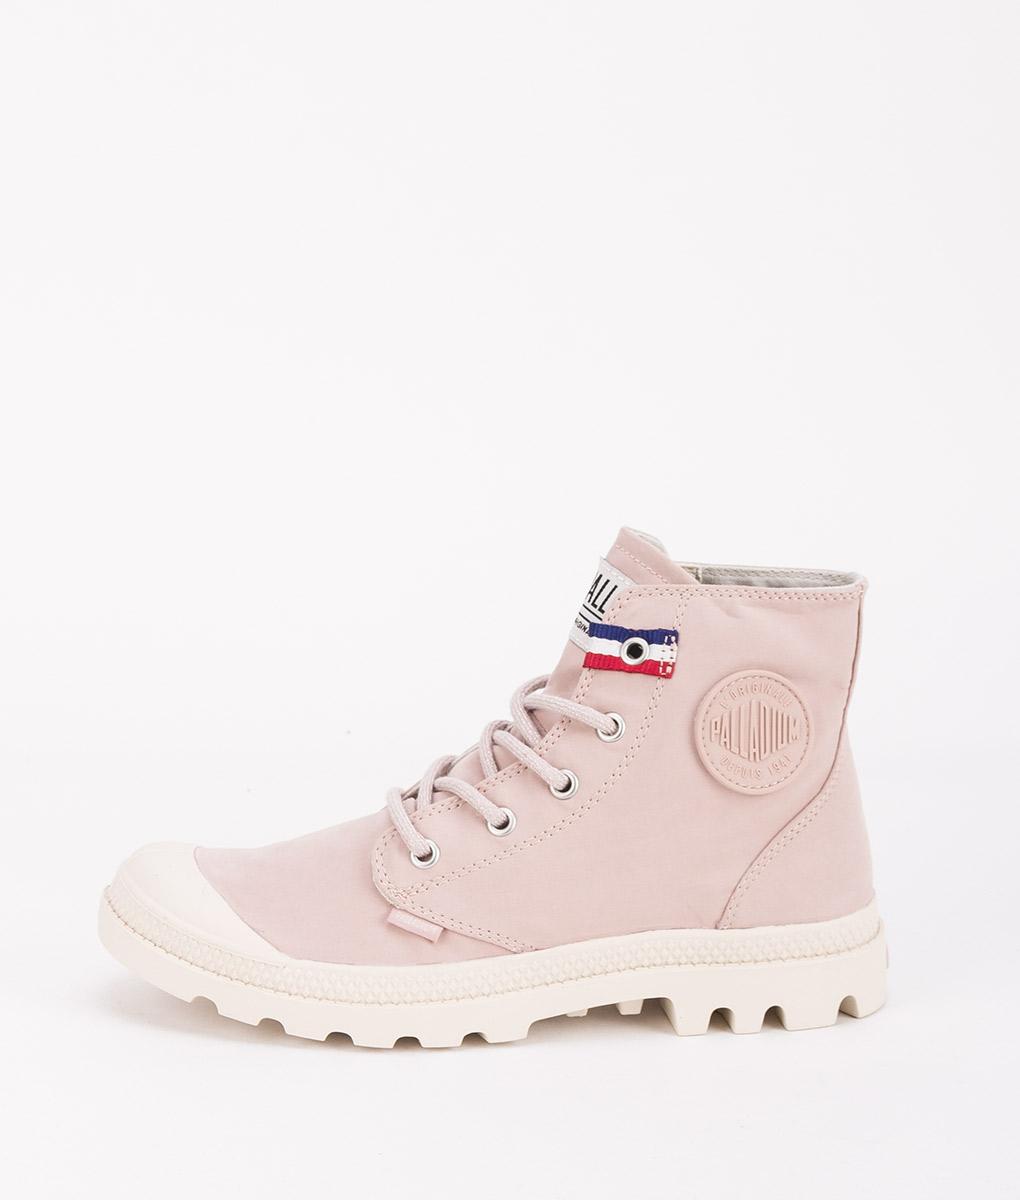 PALLADIUM Women Sneakers 75753 PAMPA HI RIVE, Rose Dust French Tape 79.99